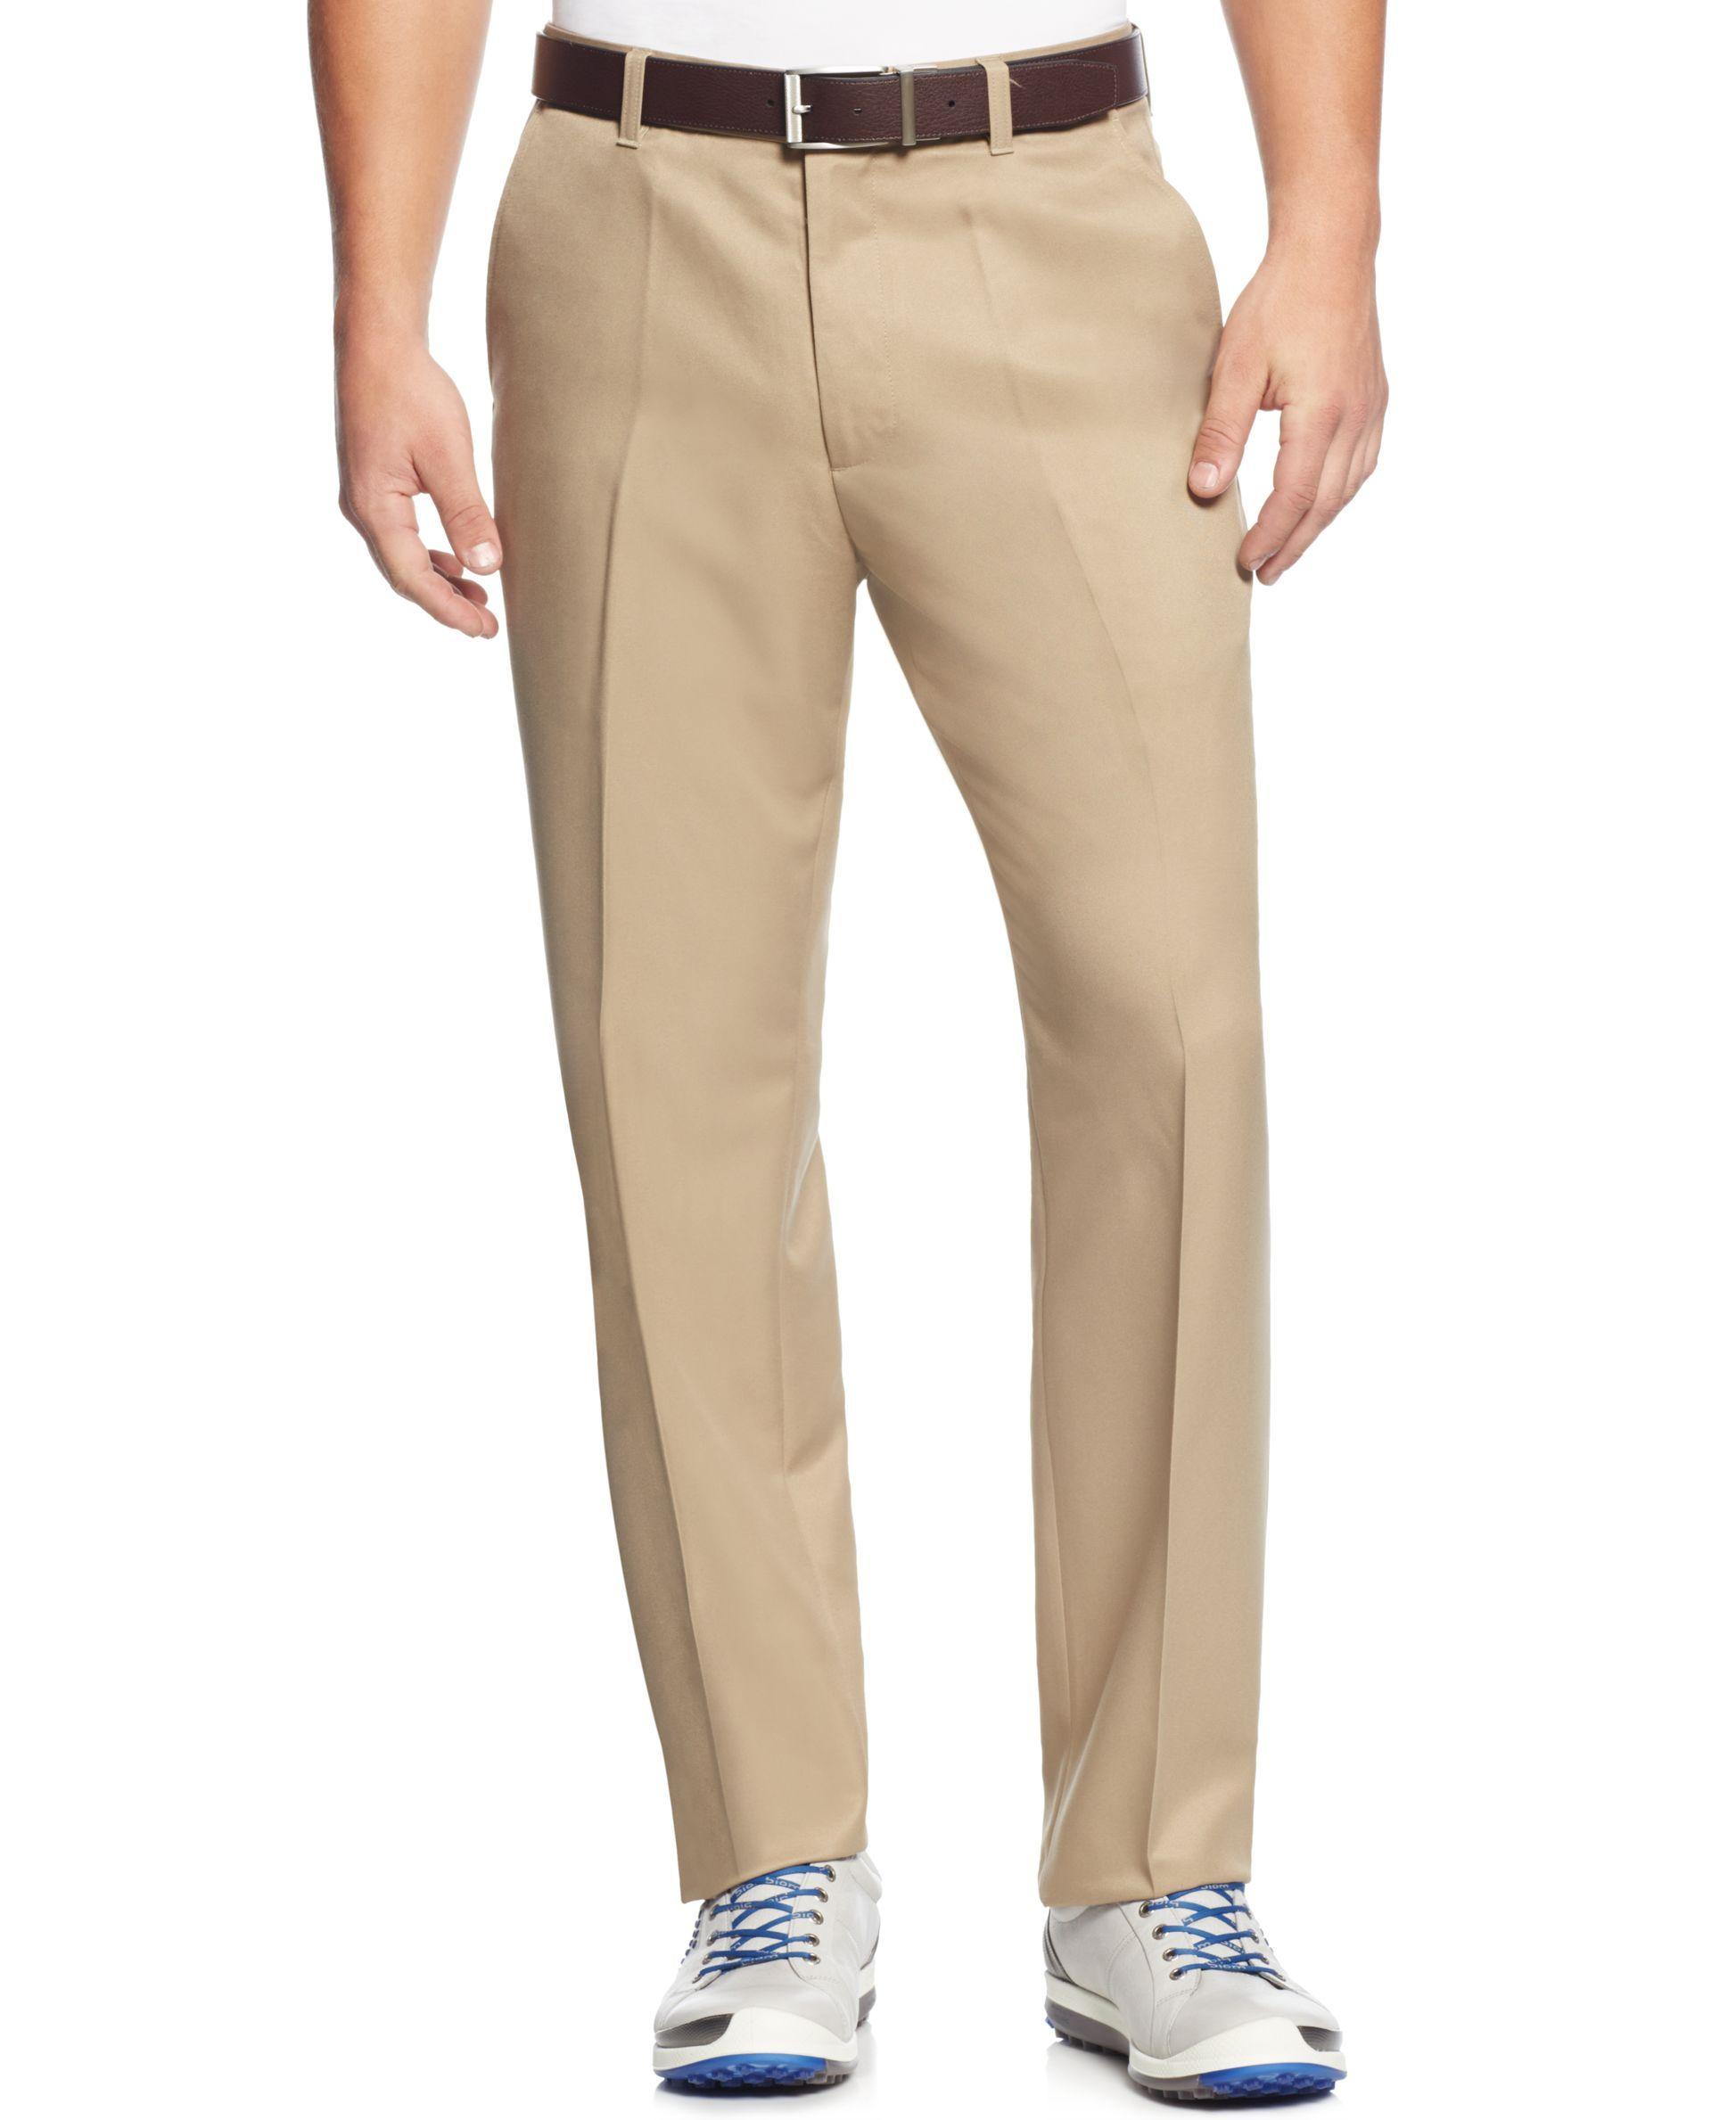 Greg Norman for Tasso Elba Men's 5 Iron Flat Front Golf Pants - Pants - Men  - Macy's